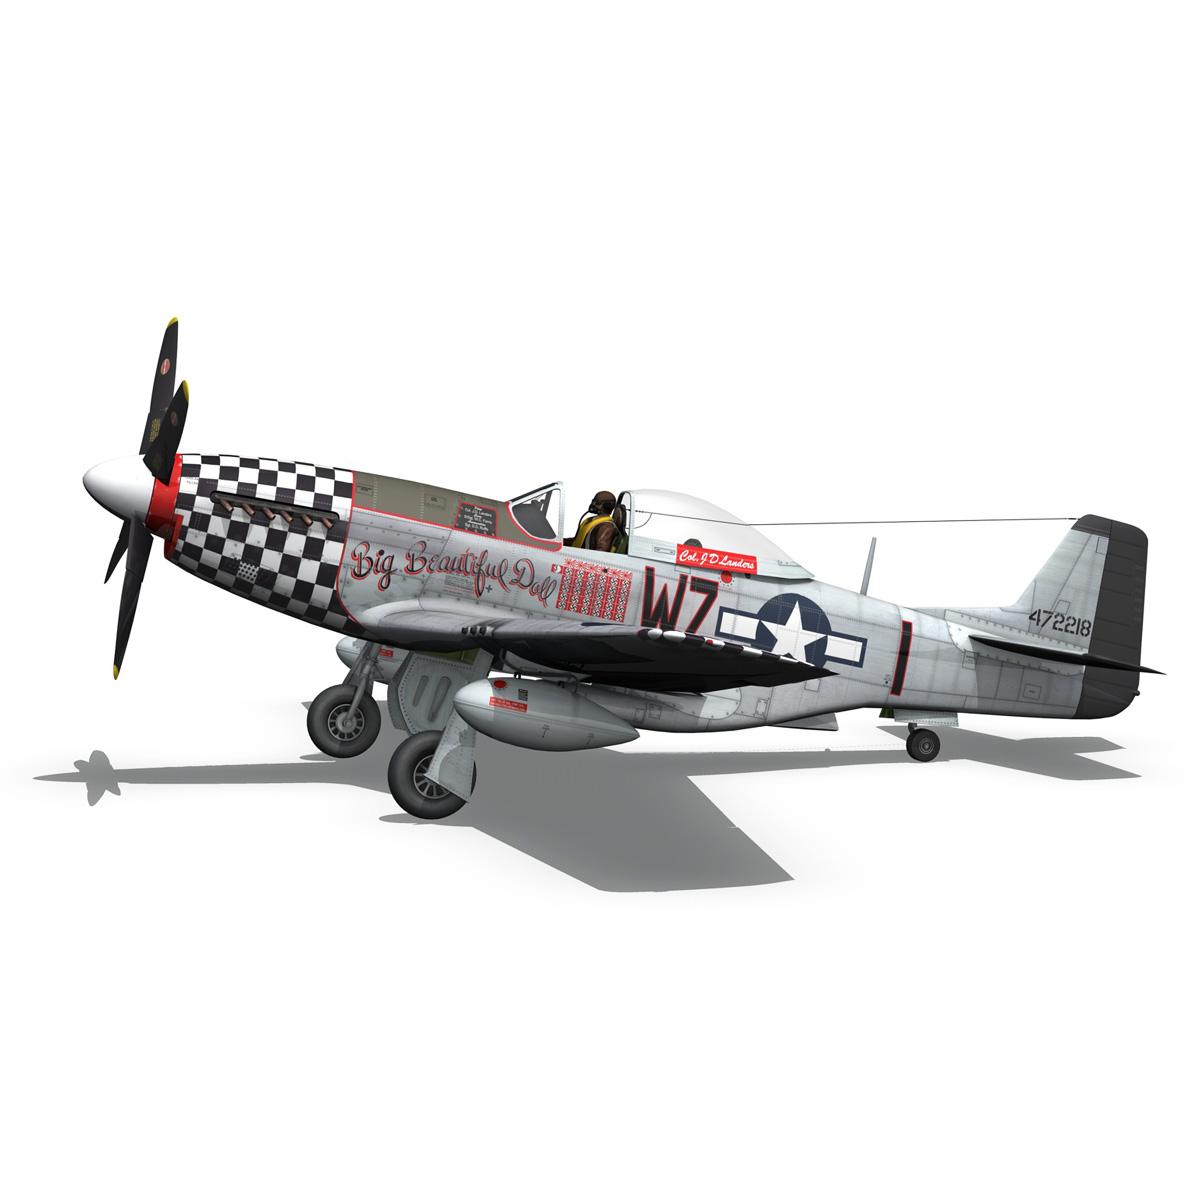 north american p-51d mustang – big beautiful doll 3d model fbx c4d lwo obj 282562